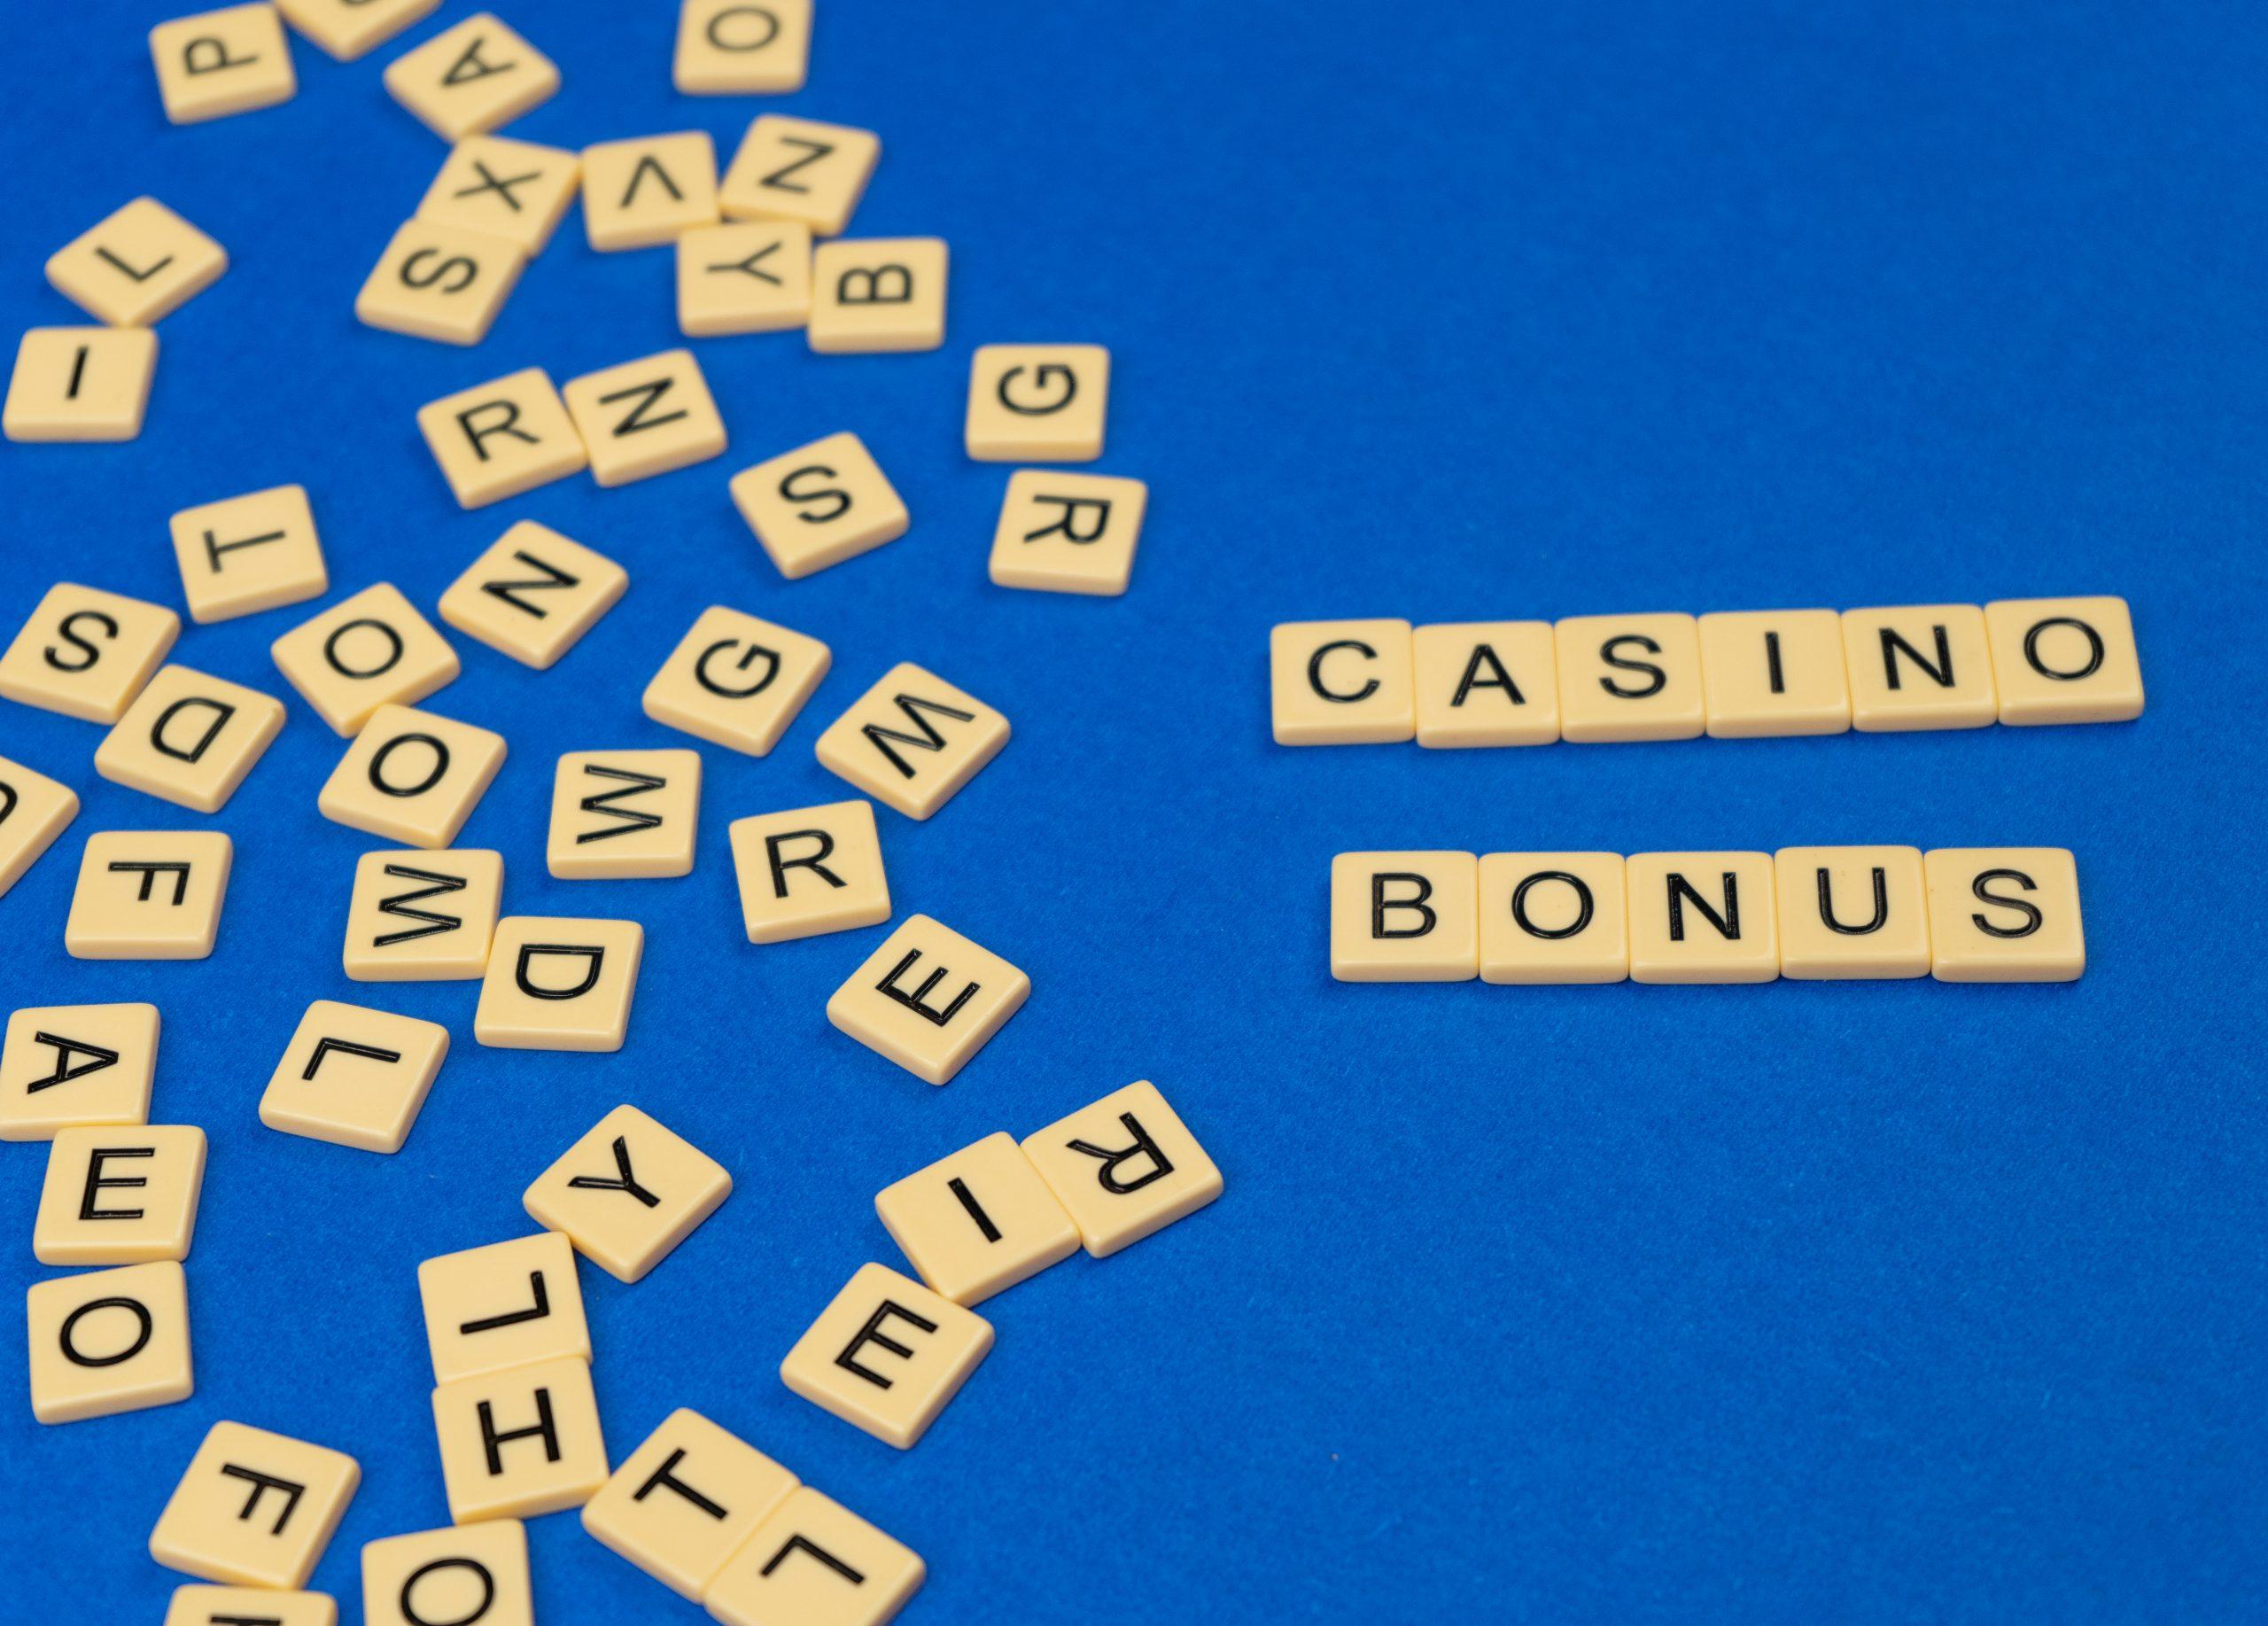 Casino bonus written on scrabble